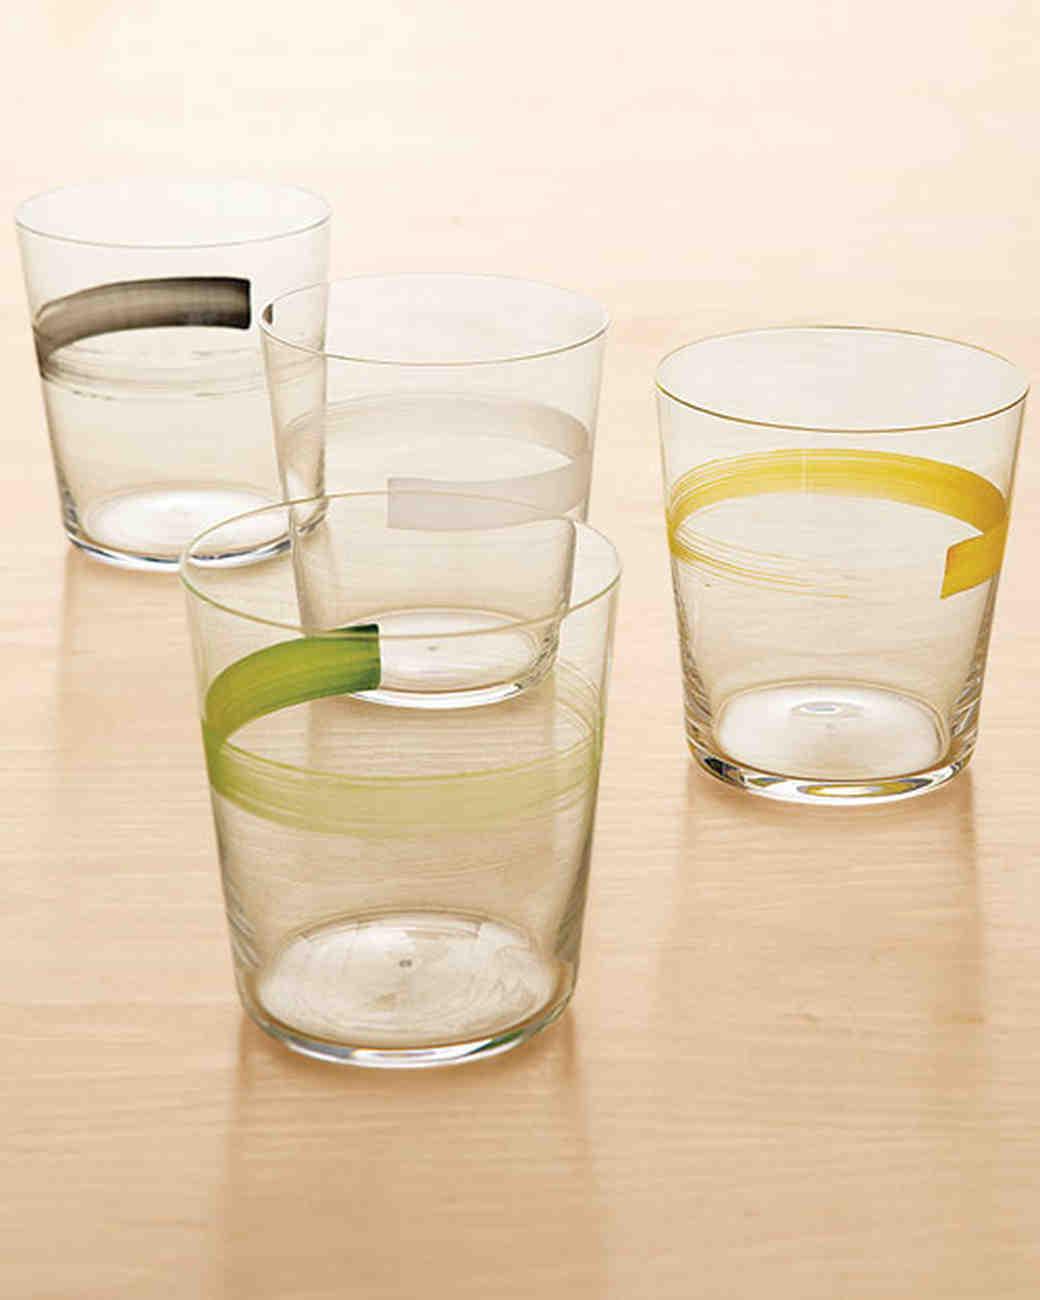 mw106509_spr11_glasscups1.jpg